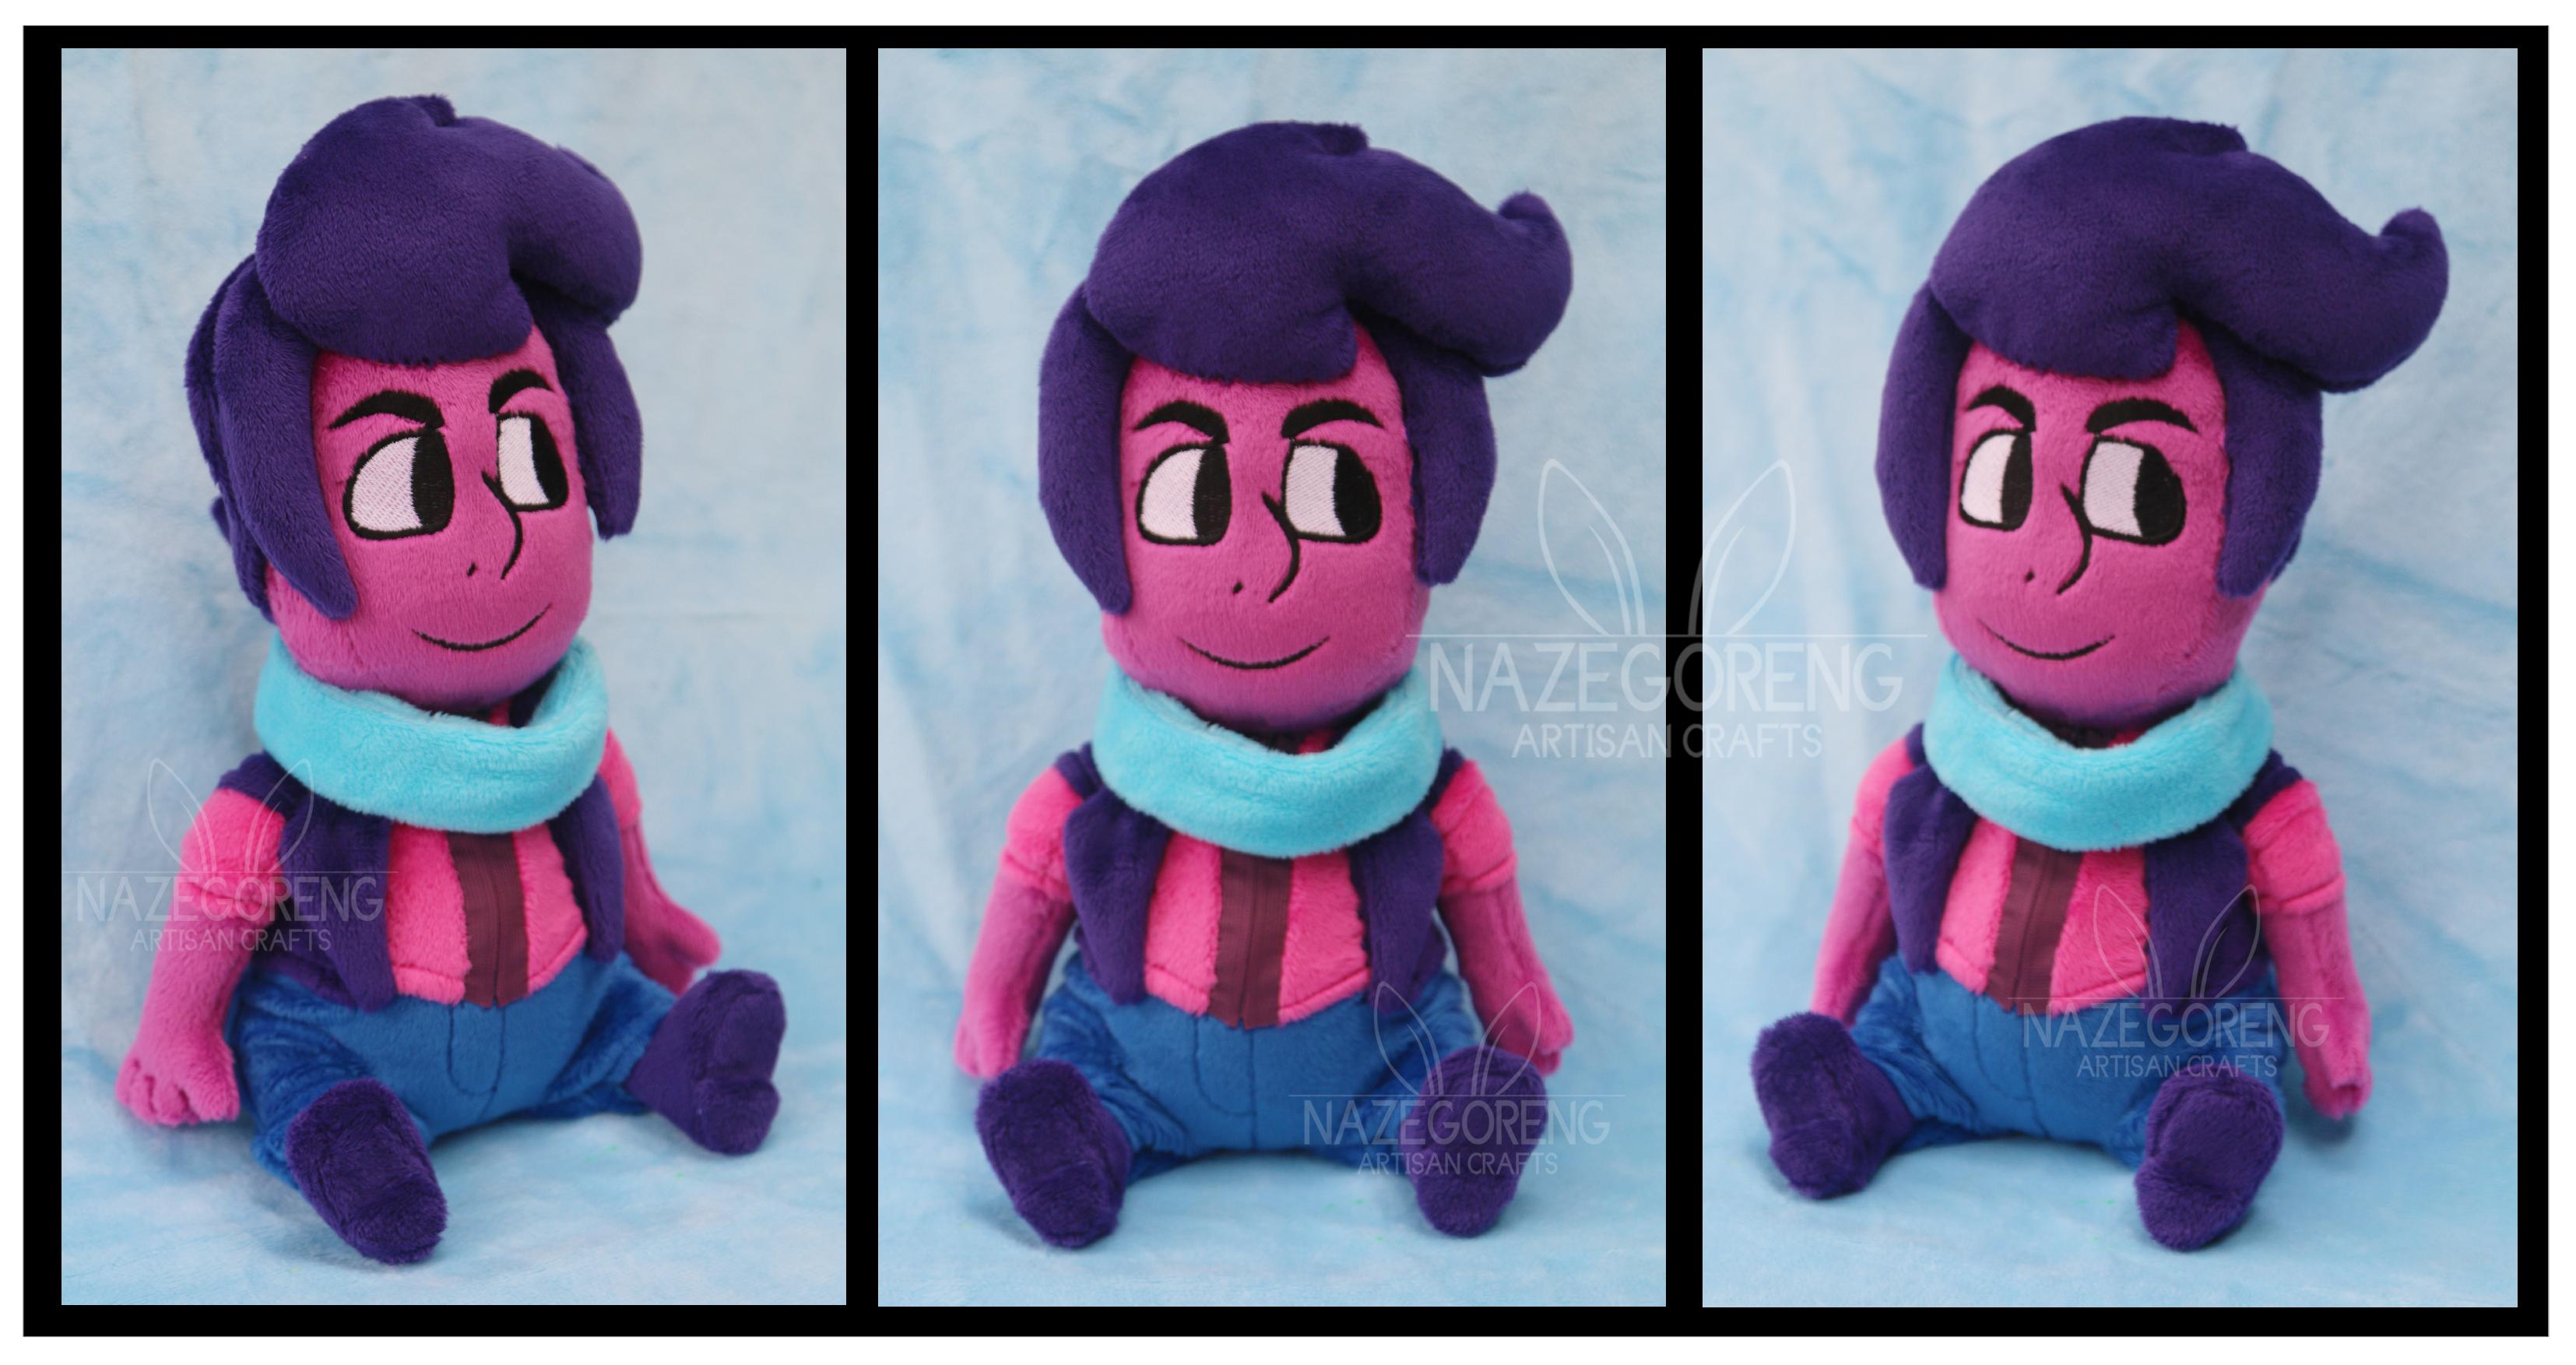 Chibi Kevin (SU) custom plush by Nazegoreng